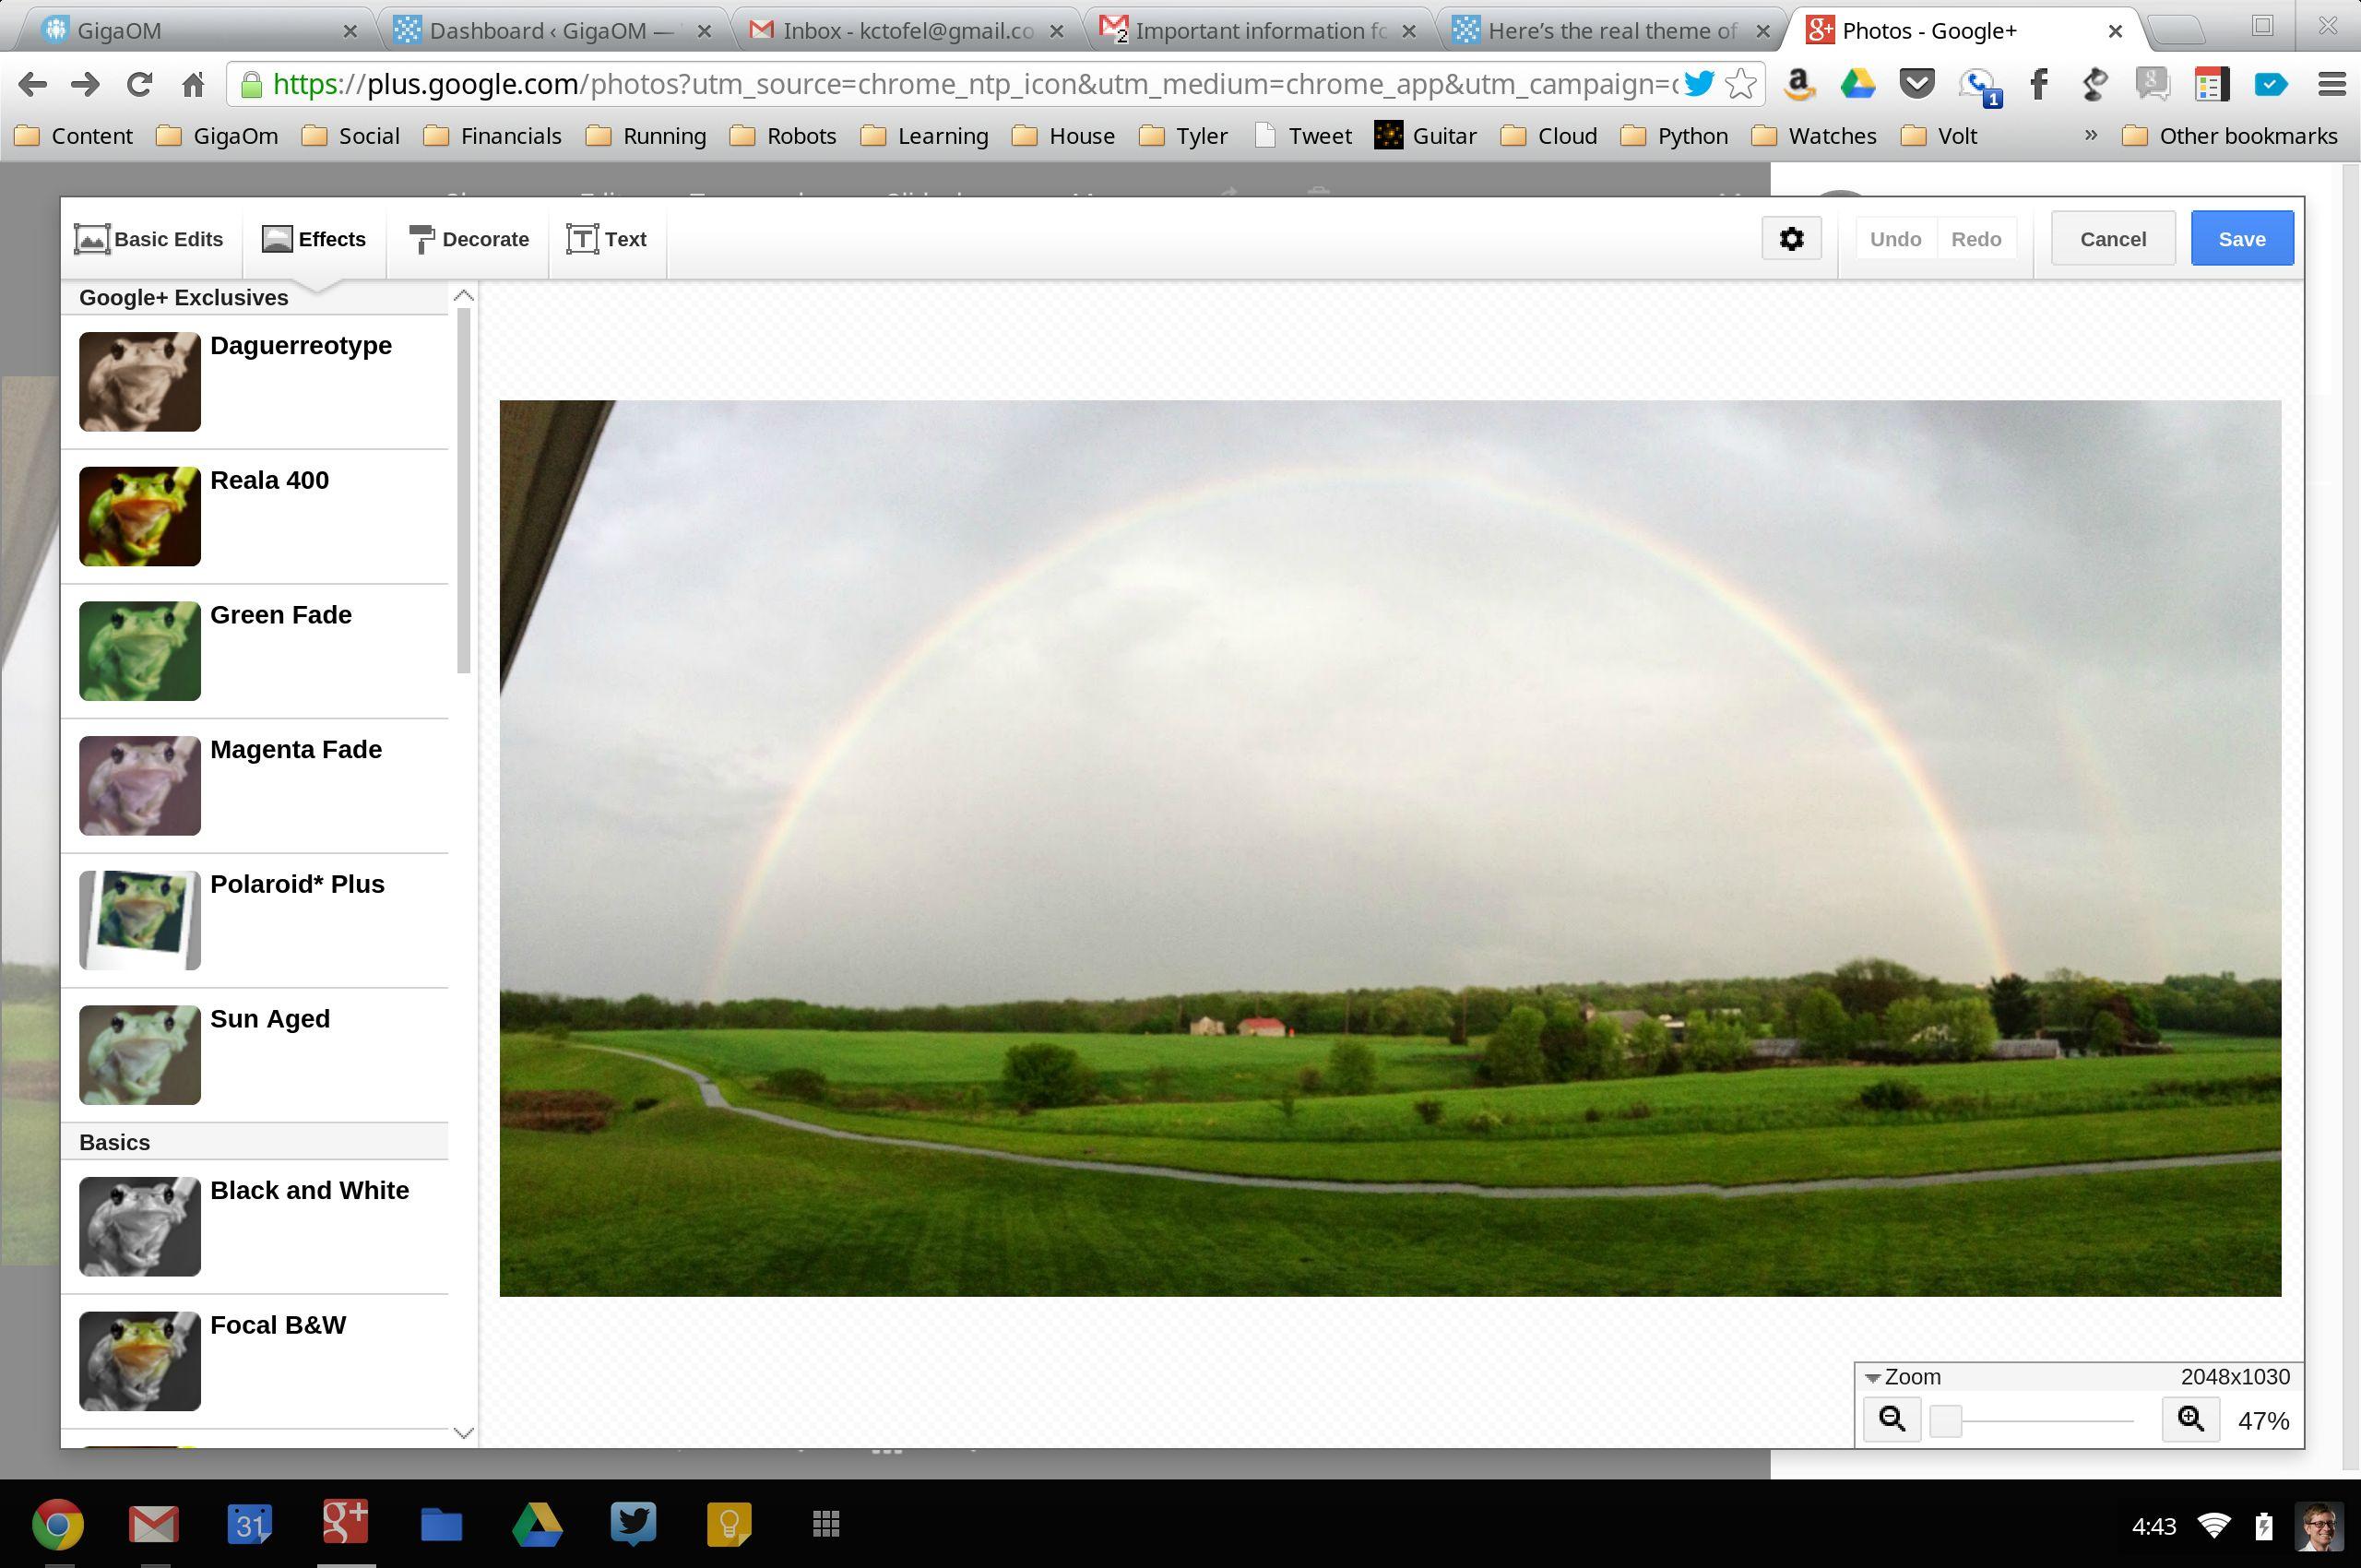 Google Plus photo editor